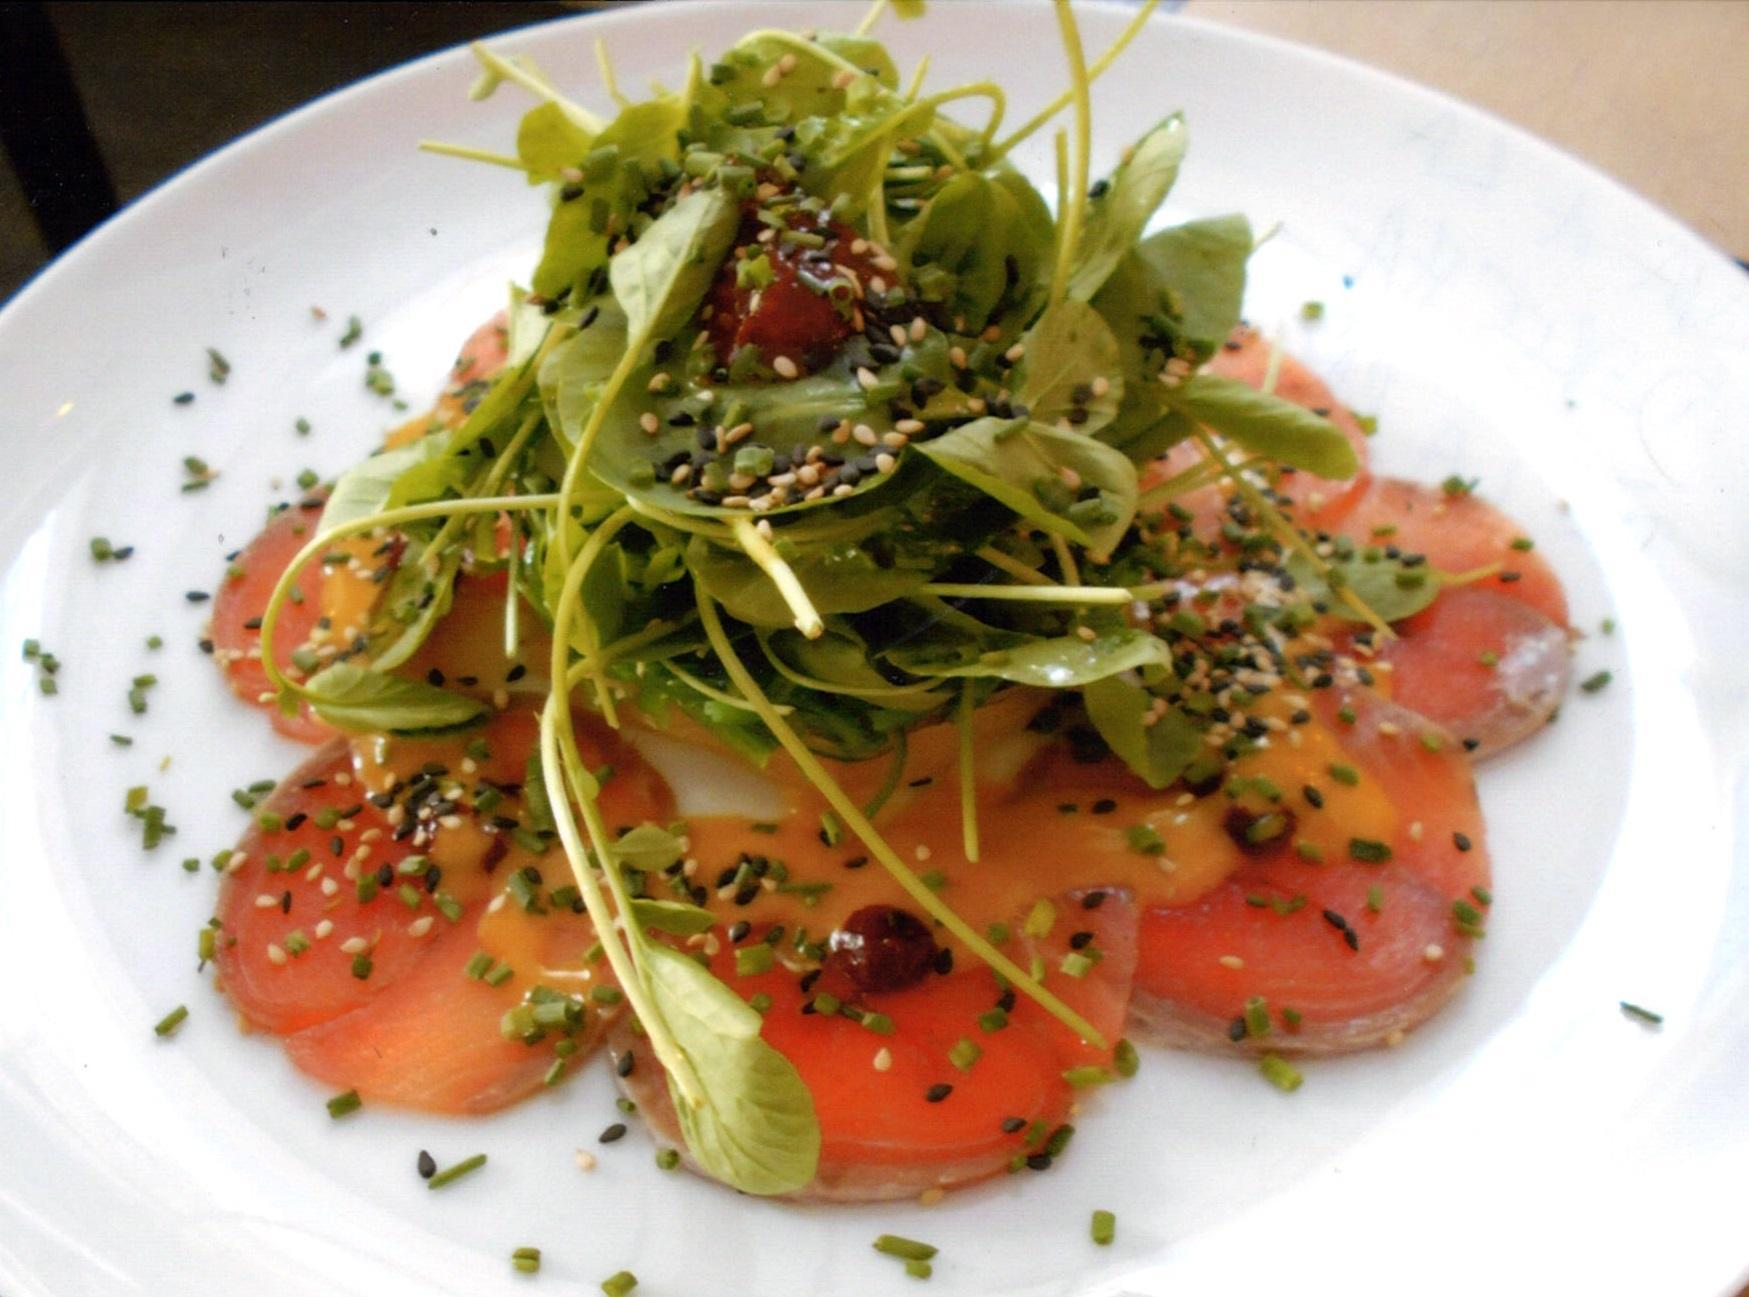 The Salmon Salad.